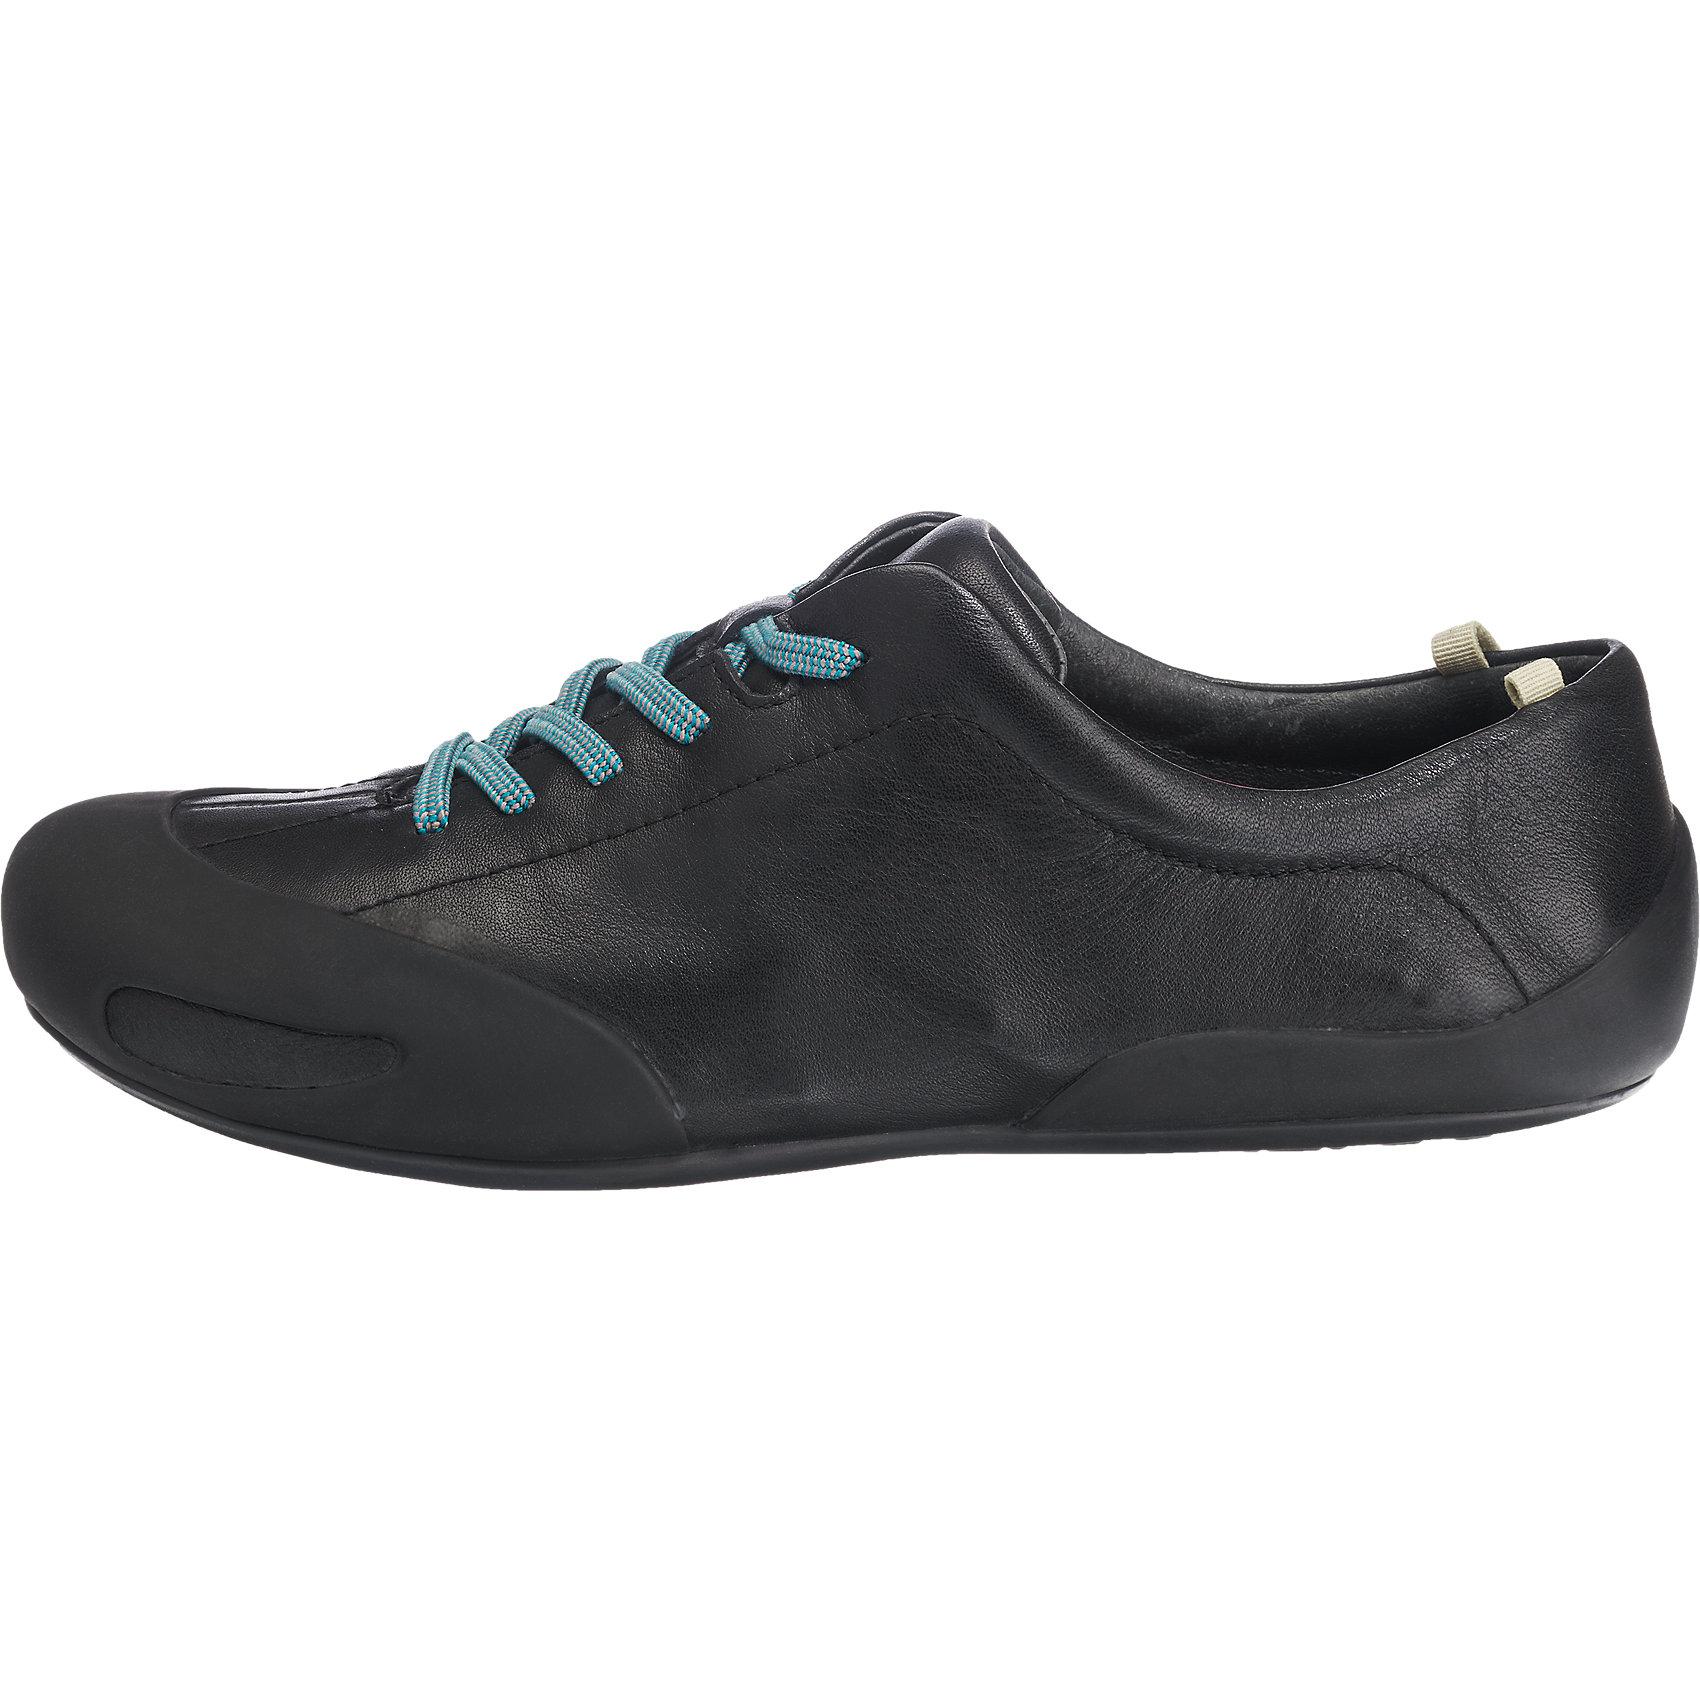 Camper Details Schwarz Rot Zu Neu 5765467 Peu Kombi Senda Sneakers Weiß YDeIWEH29